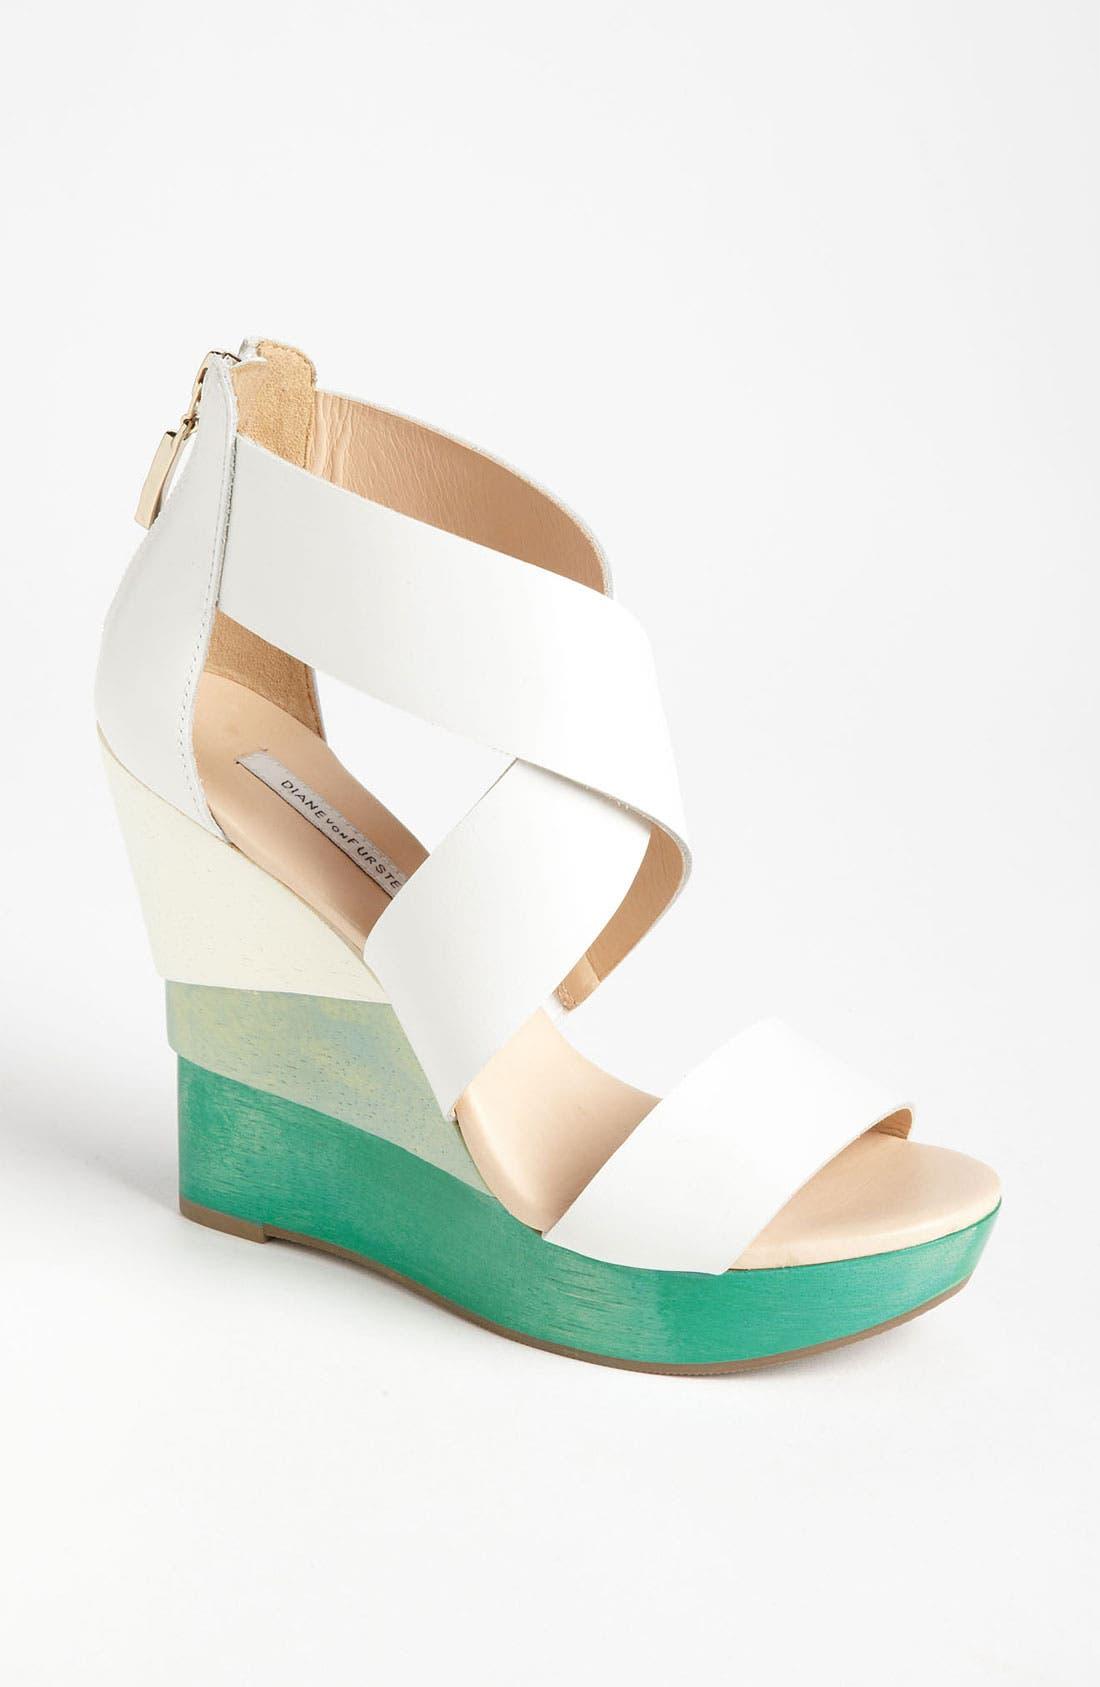 Alternate Image 1 Selected - Diane von Furstenberg 'Opal' Wedge Sandal